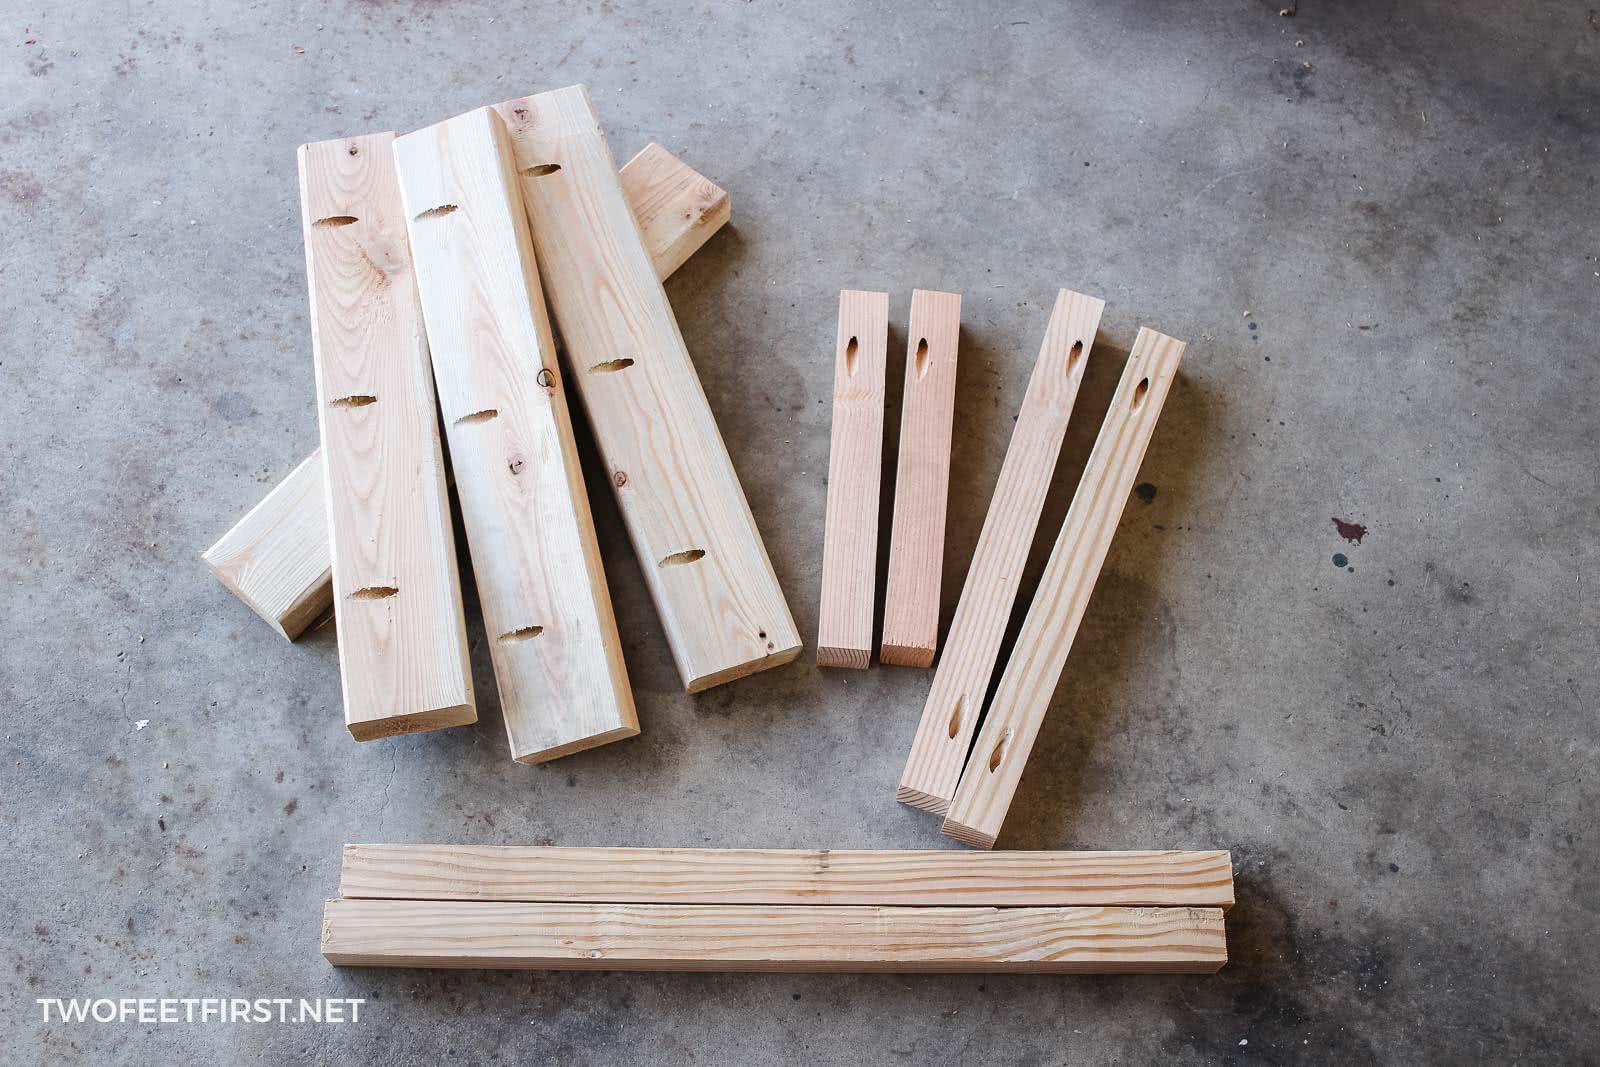 wood to build laptop desk